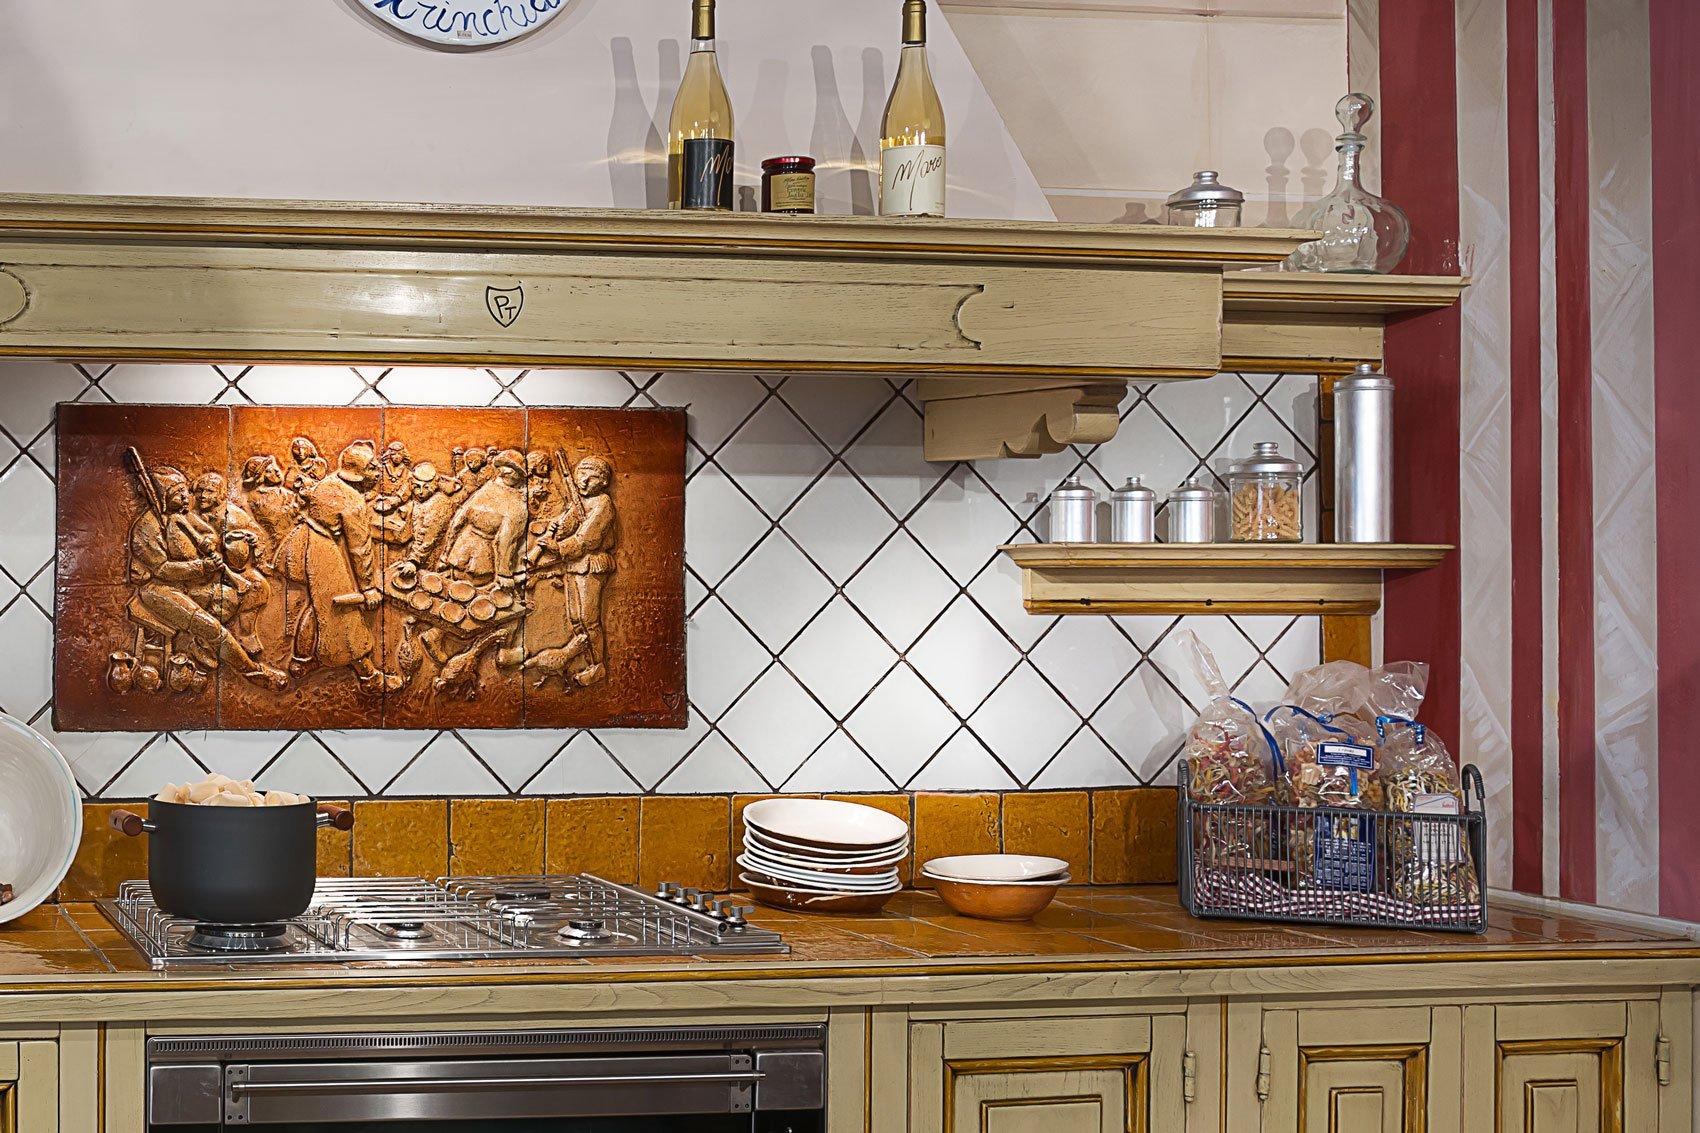 foto di rivestimento cucina di piastrelle 10x10 : piastrellecristiani-tarsiepisane-piastrelleparetecucina